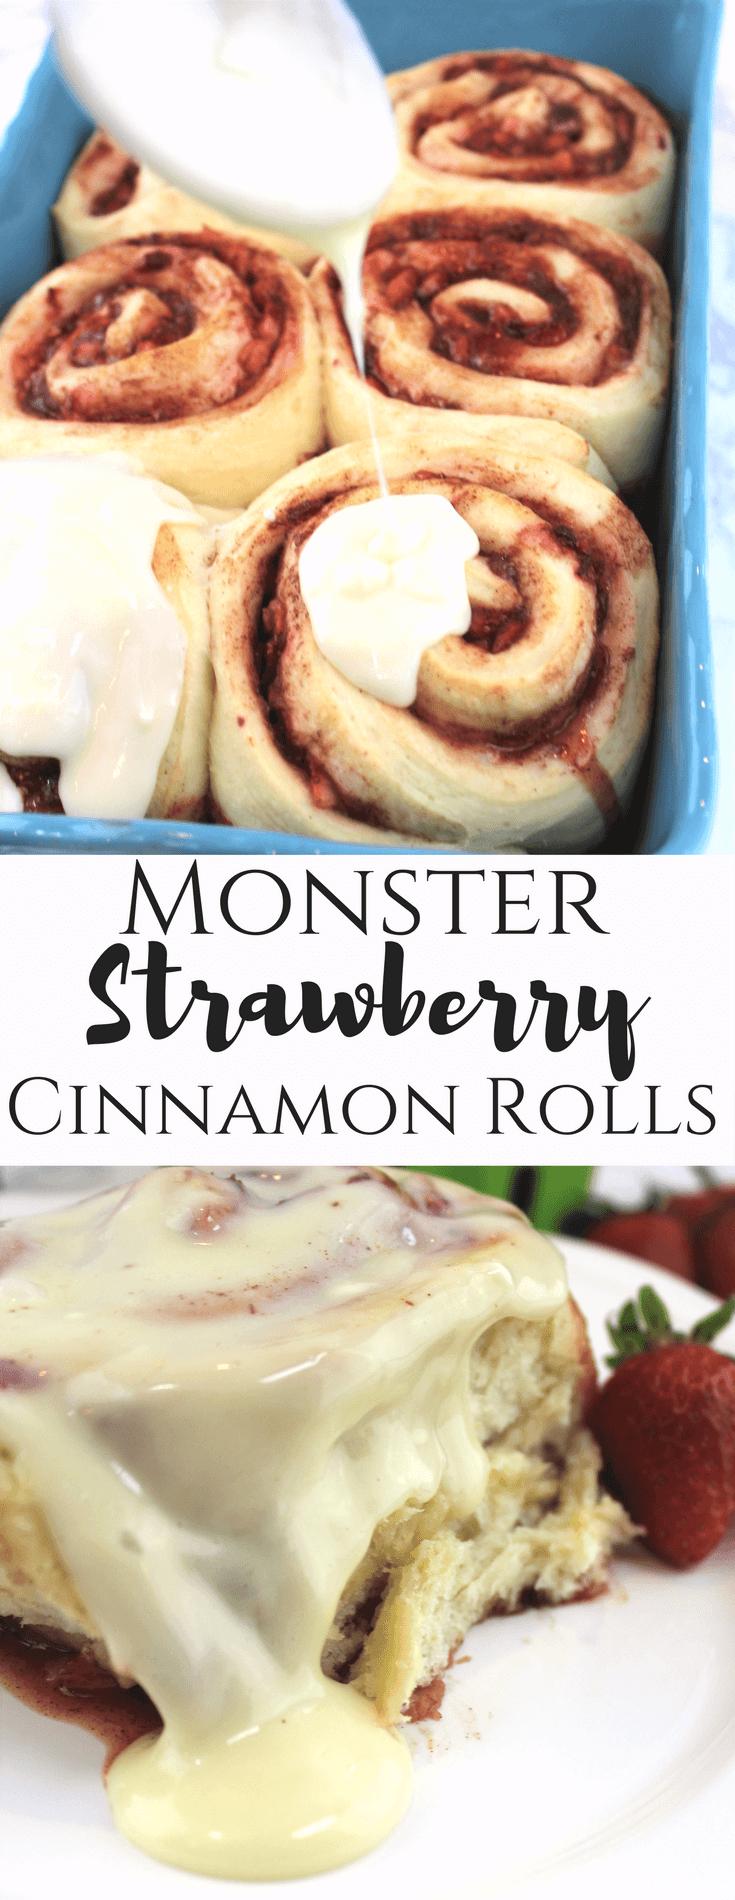 Monster Strawberry Cinnamon Rolls